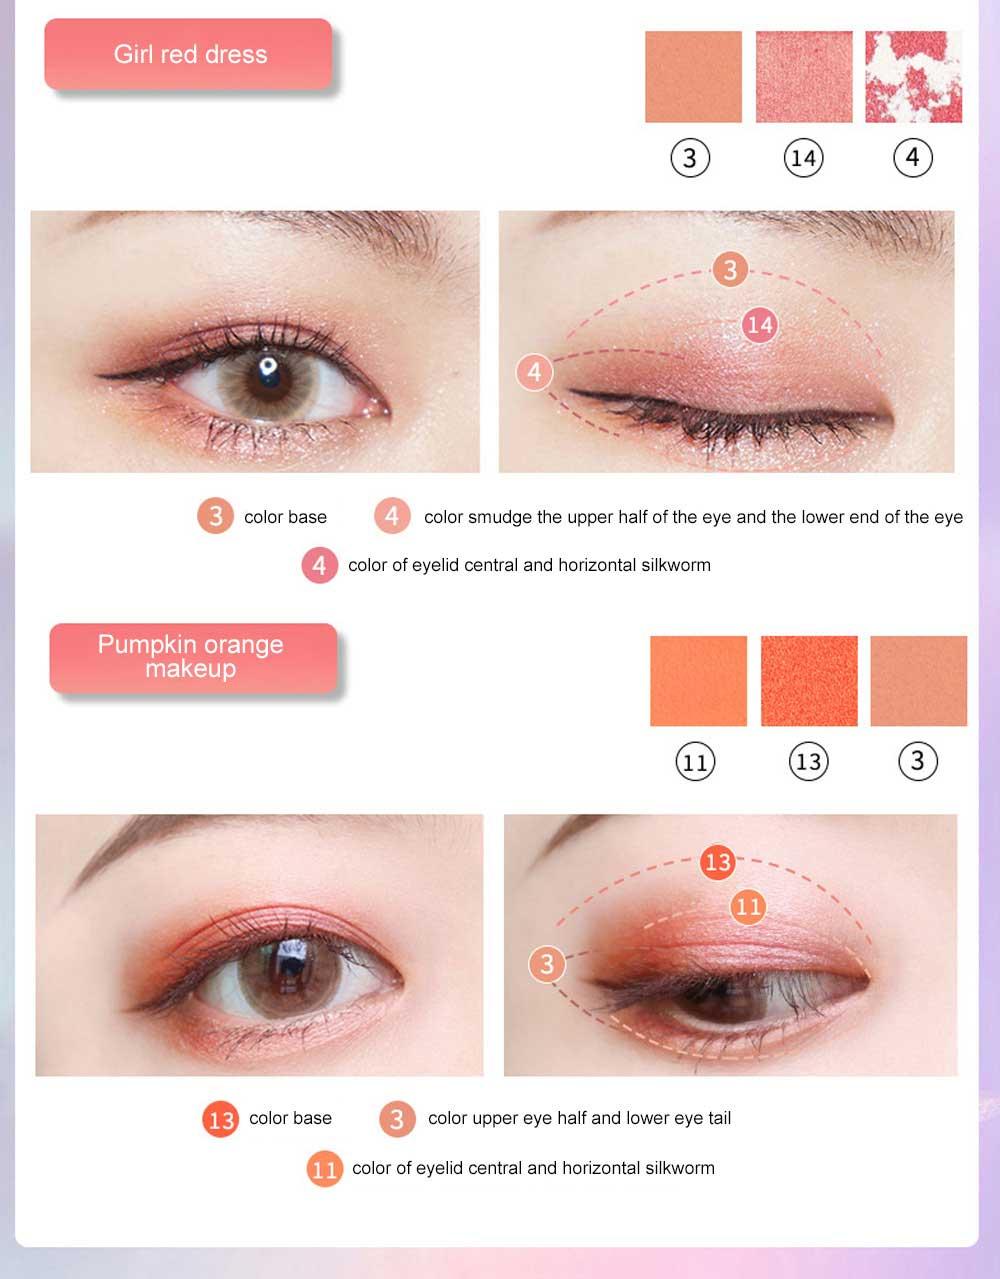 Cosmetics Makeup 15 Color Glitter Eyeshadow Waterproof Easy Clean Palette Eye Shadow Make Up Palettes 7